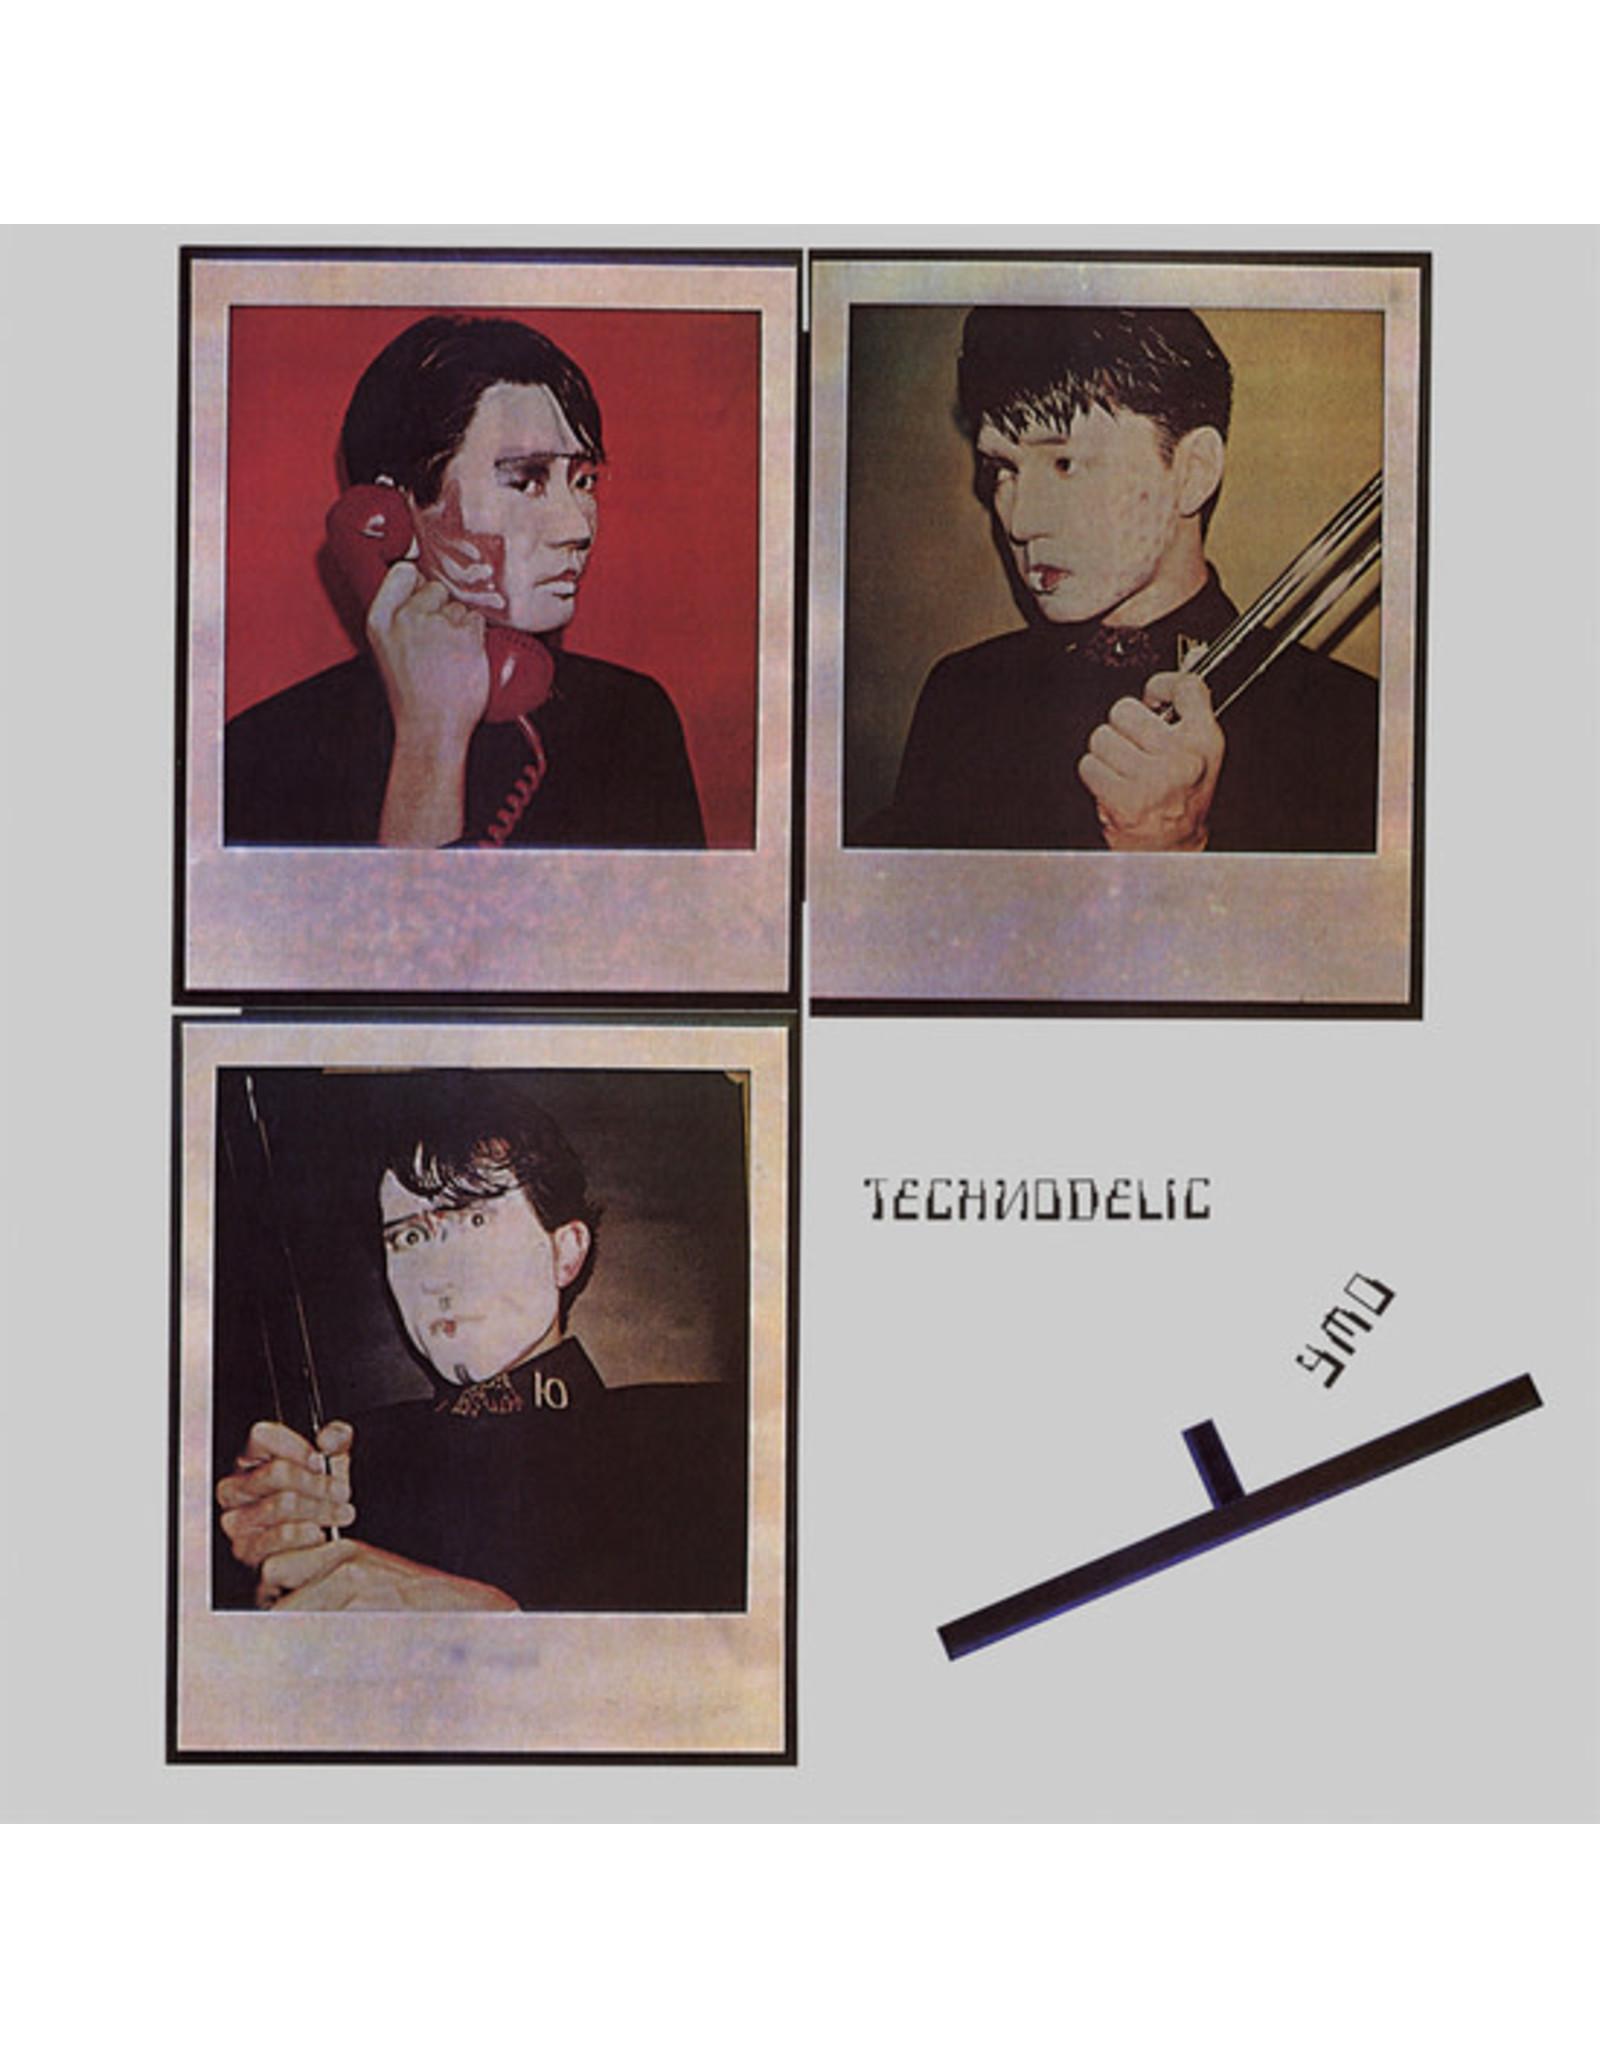 Great Tracks Yellow Magic Orchestra: Technodelic LP